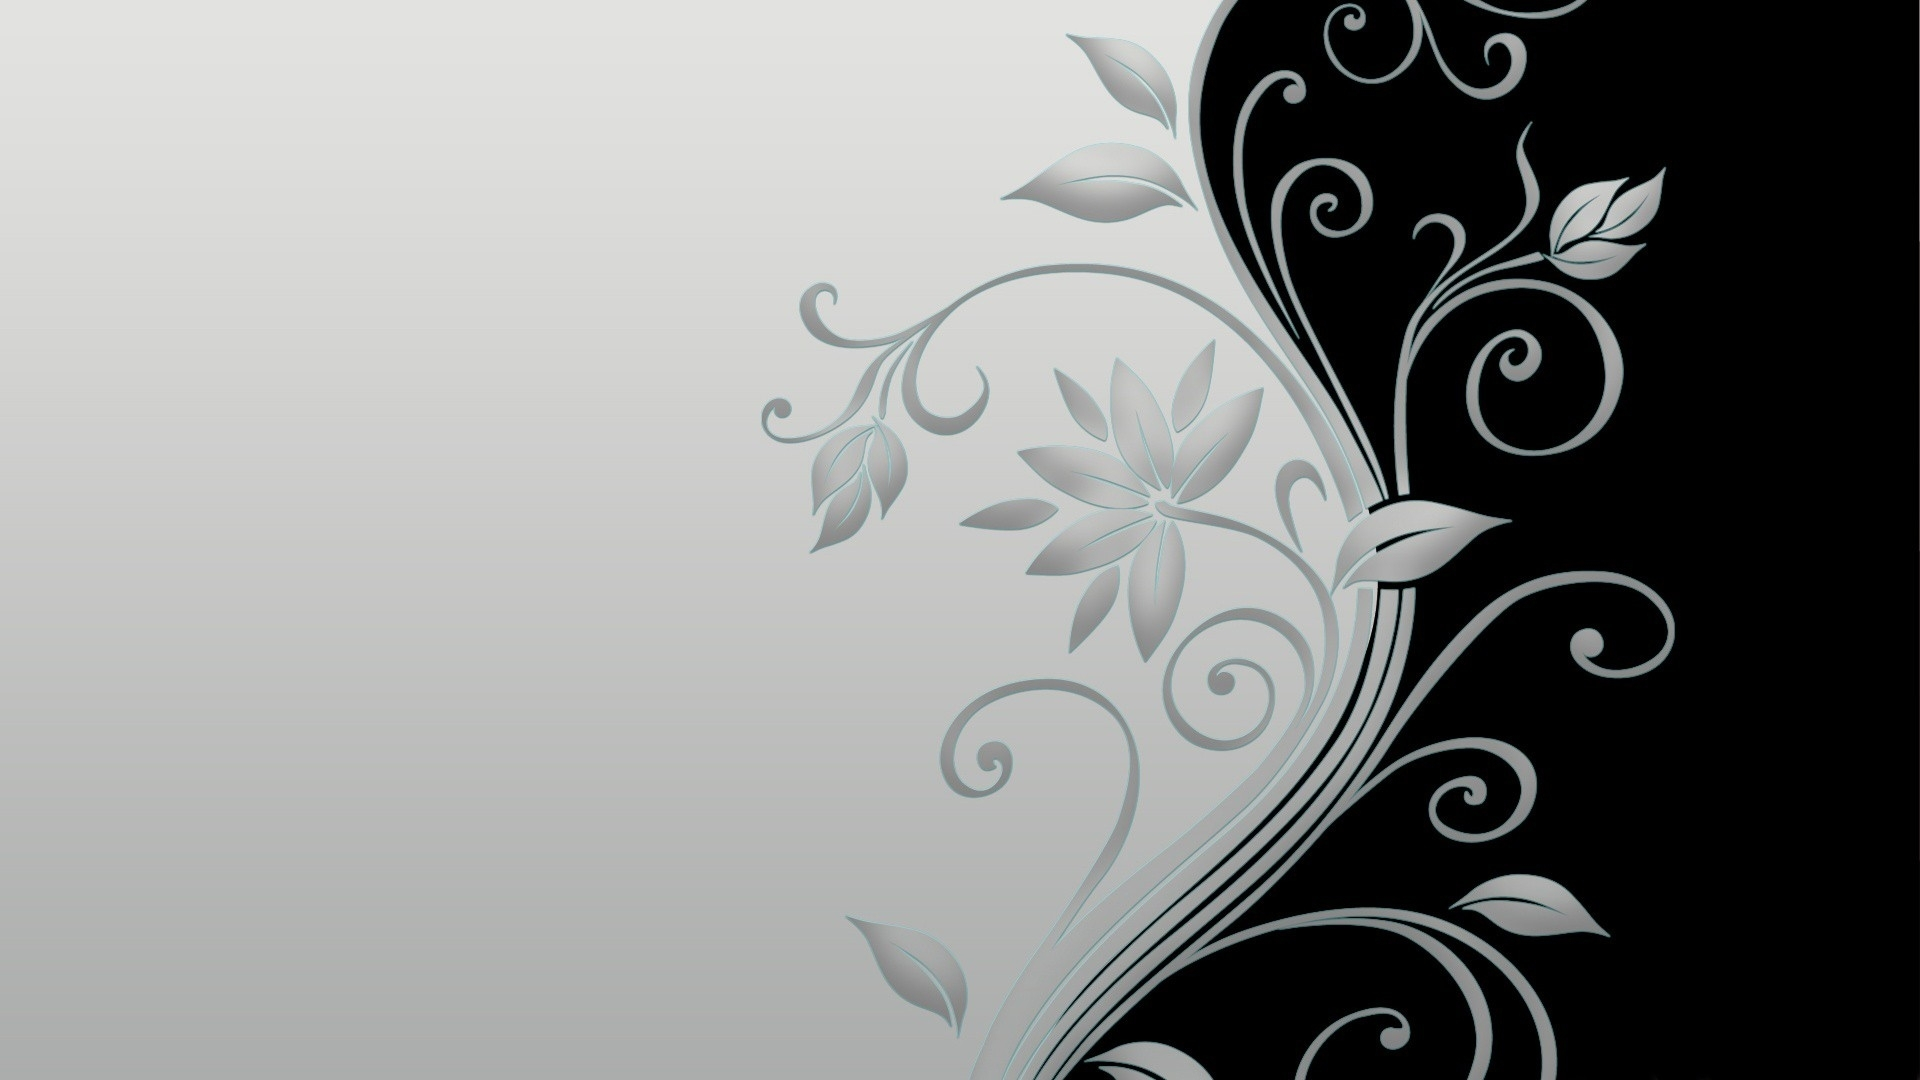 Black flower wallpapers sf wallpaper collection of black flower wallpapers on hdwallpapers mightylinksfo